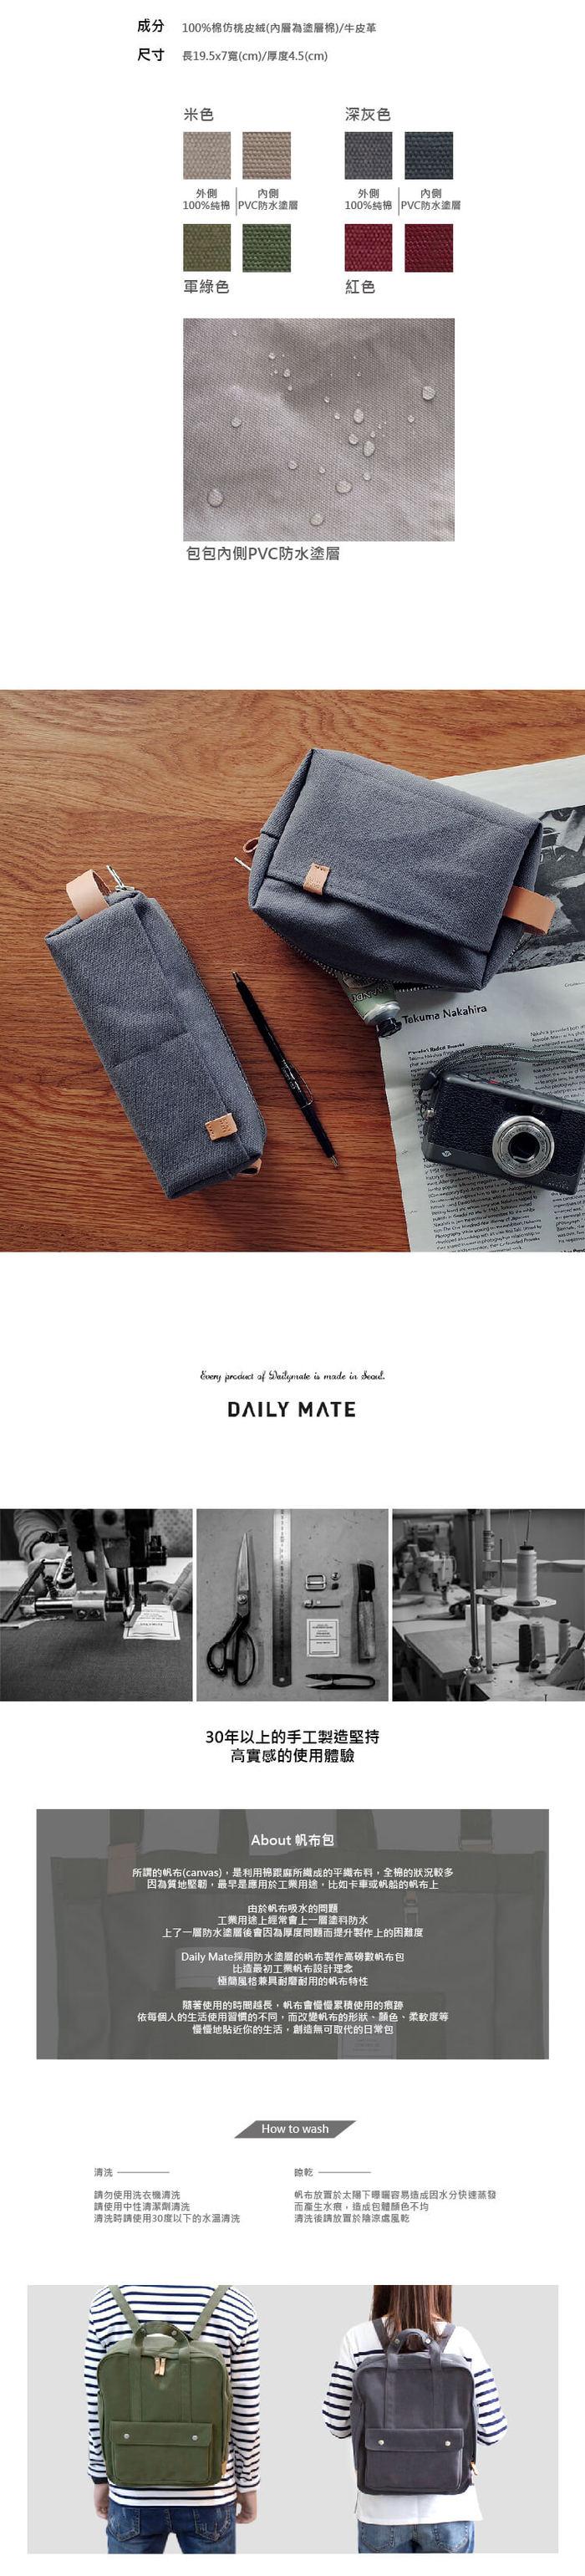 Daily mate|萬用鉛筆包(酒紅)